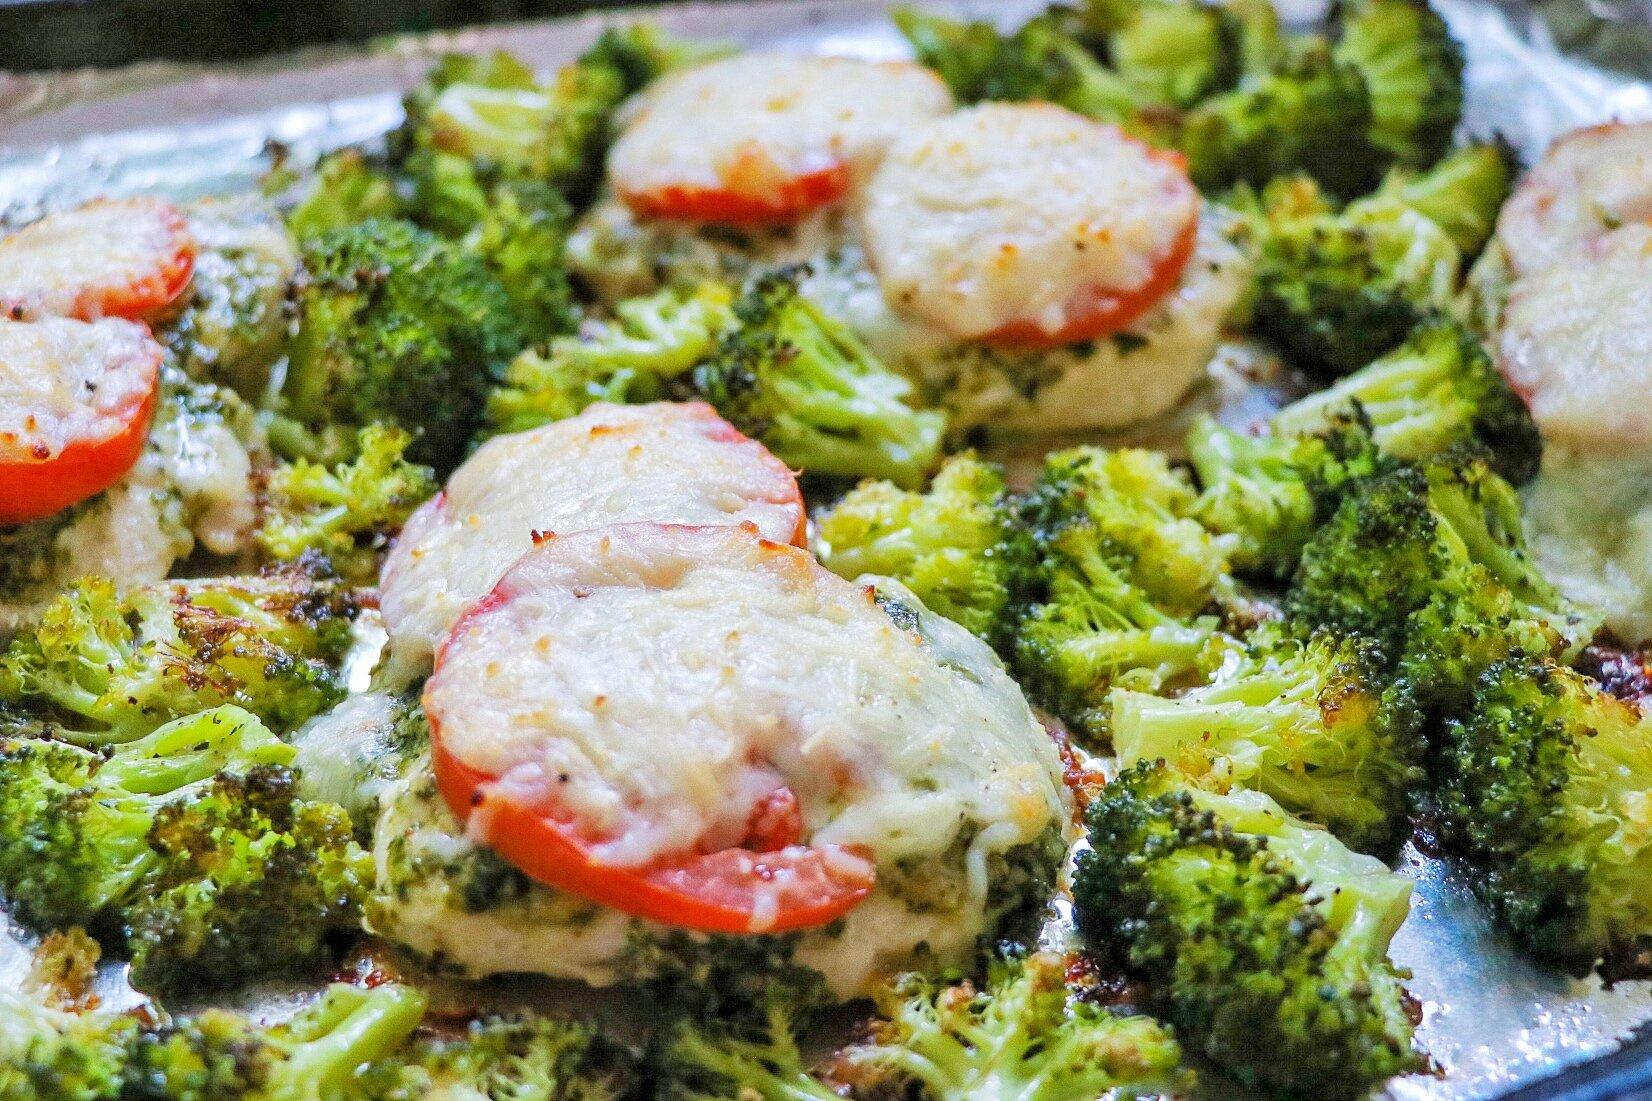 sheet pan chicken with mozzarella pesto and broccoli recipe